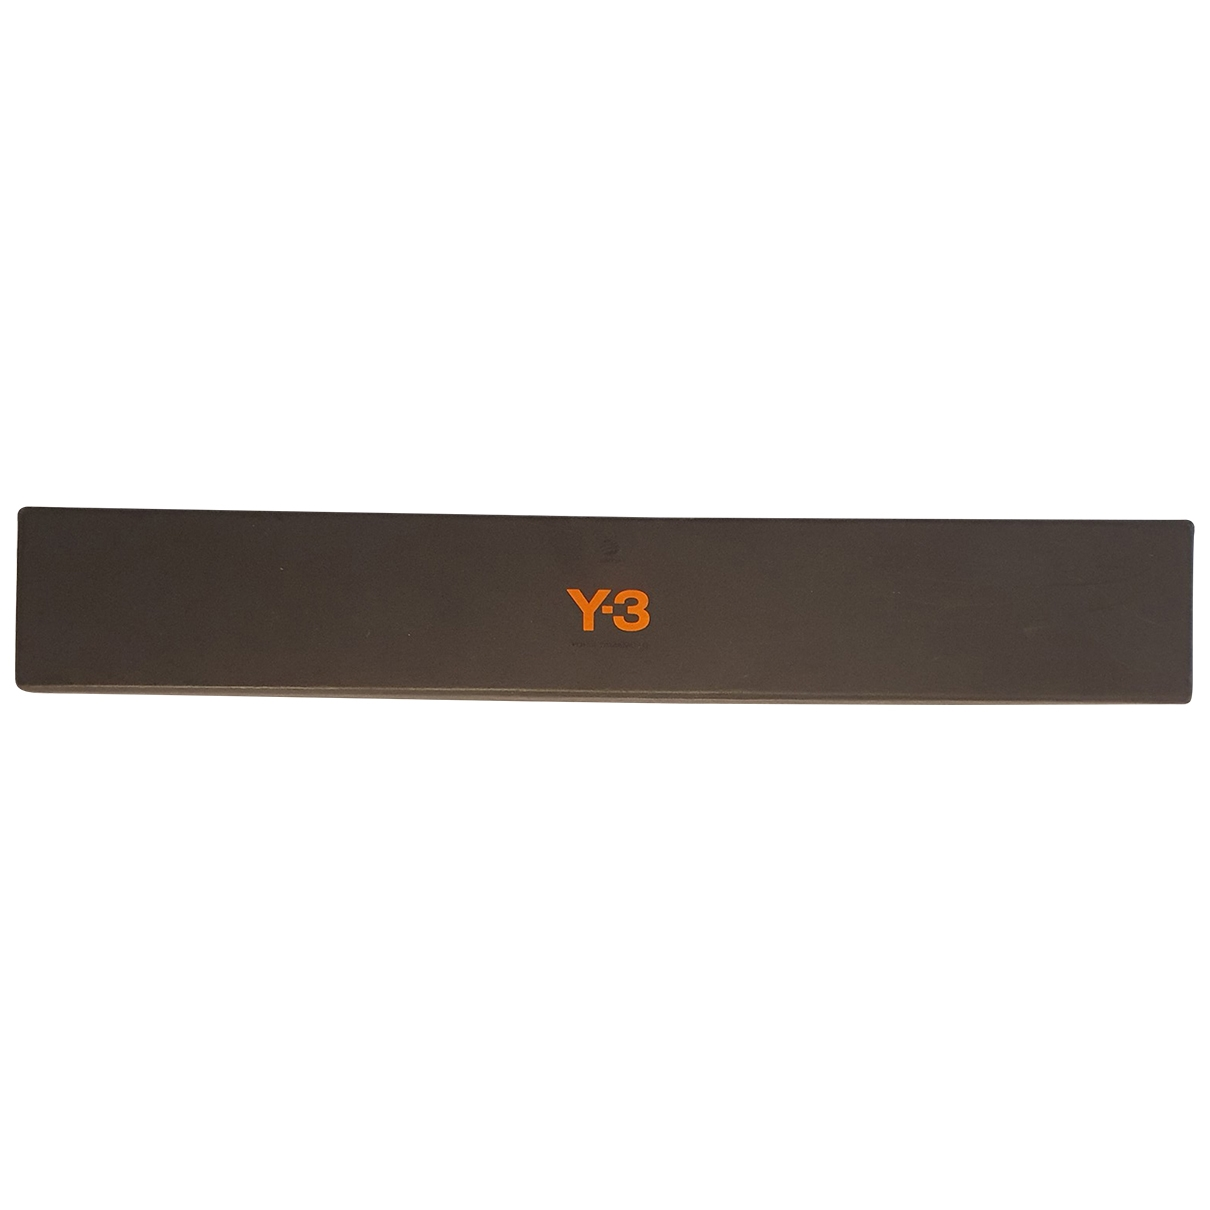 Y-3 By Yohji Yamamoto - Objets & Deco   pour lifestyle en metal - argente